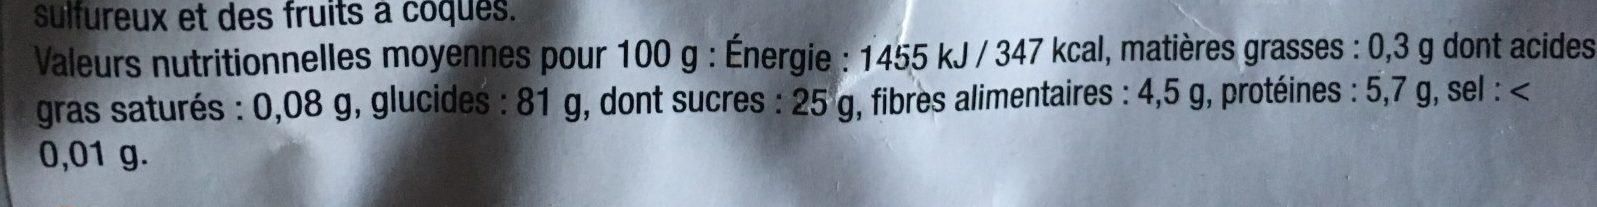 Mangues sechées - Voedingswaarden - fr